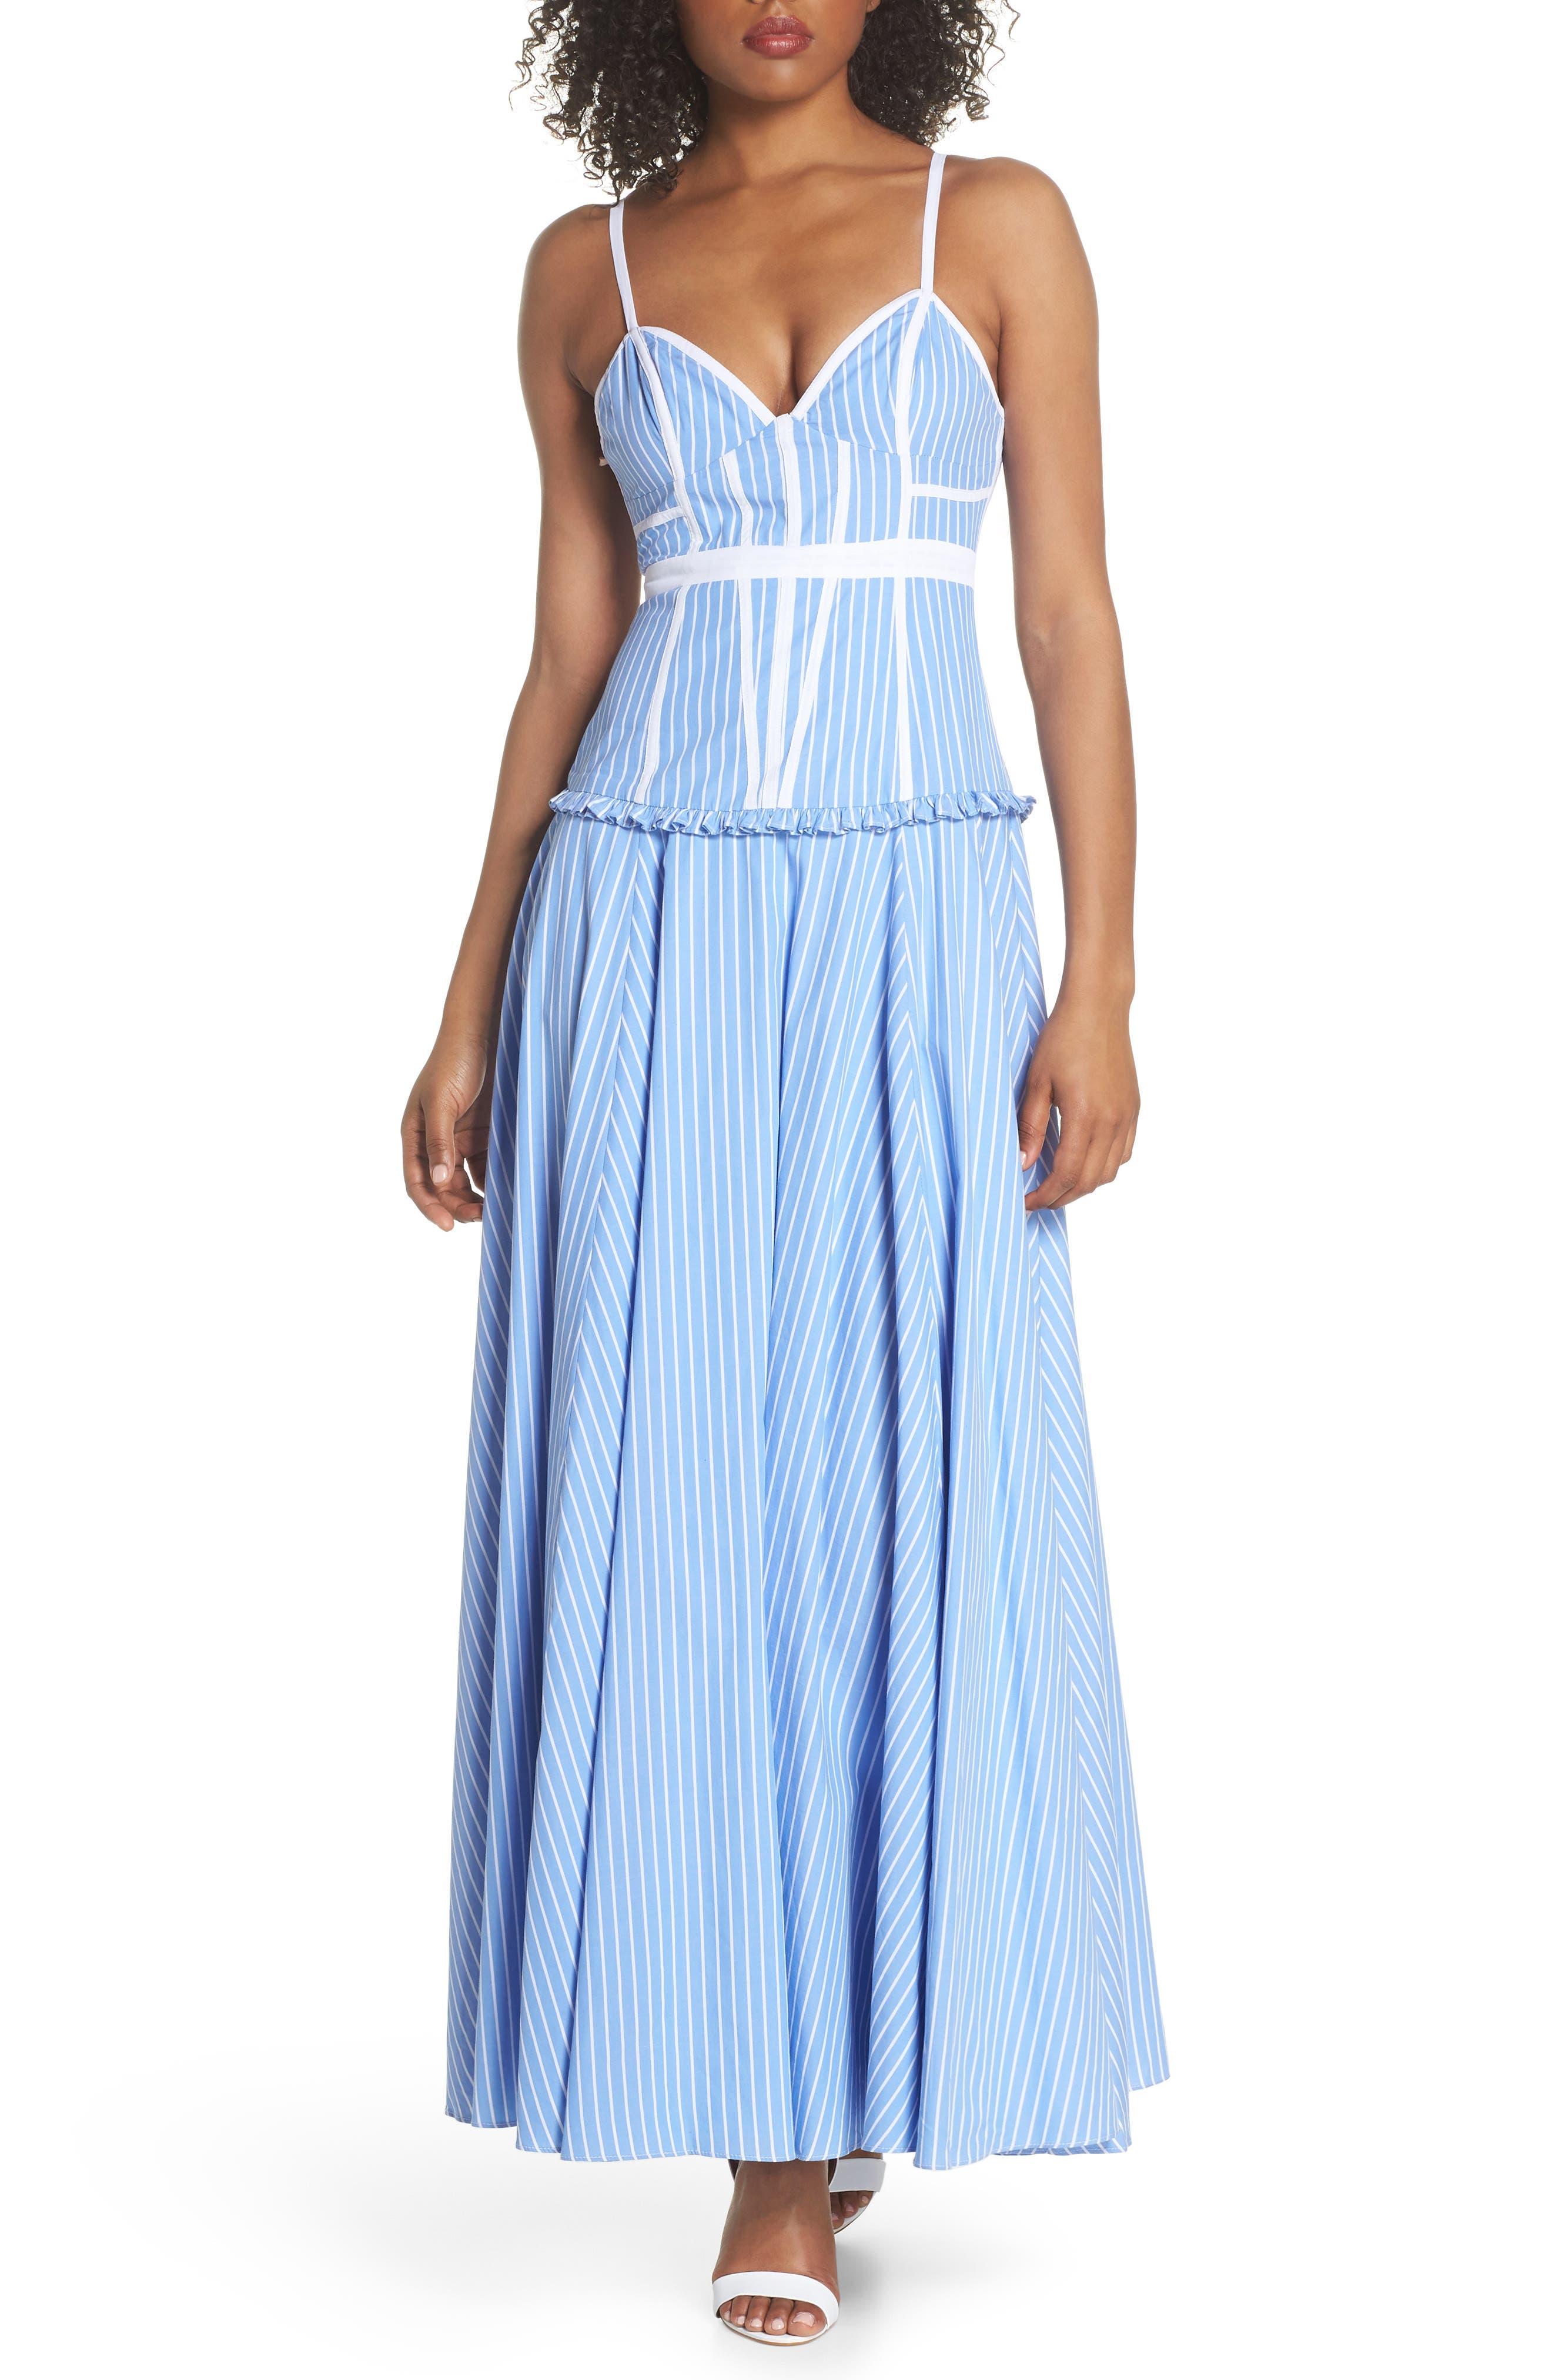 Morrow Stripe Corset Gown,                             Main thumbnail 1, color,                             Pale Blue/ White Stripe